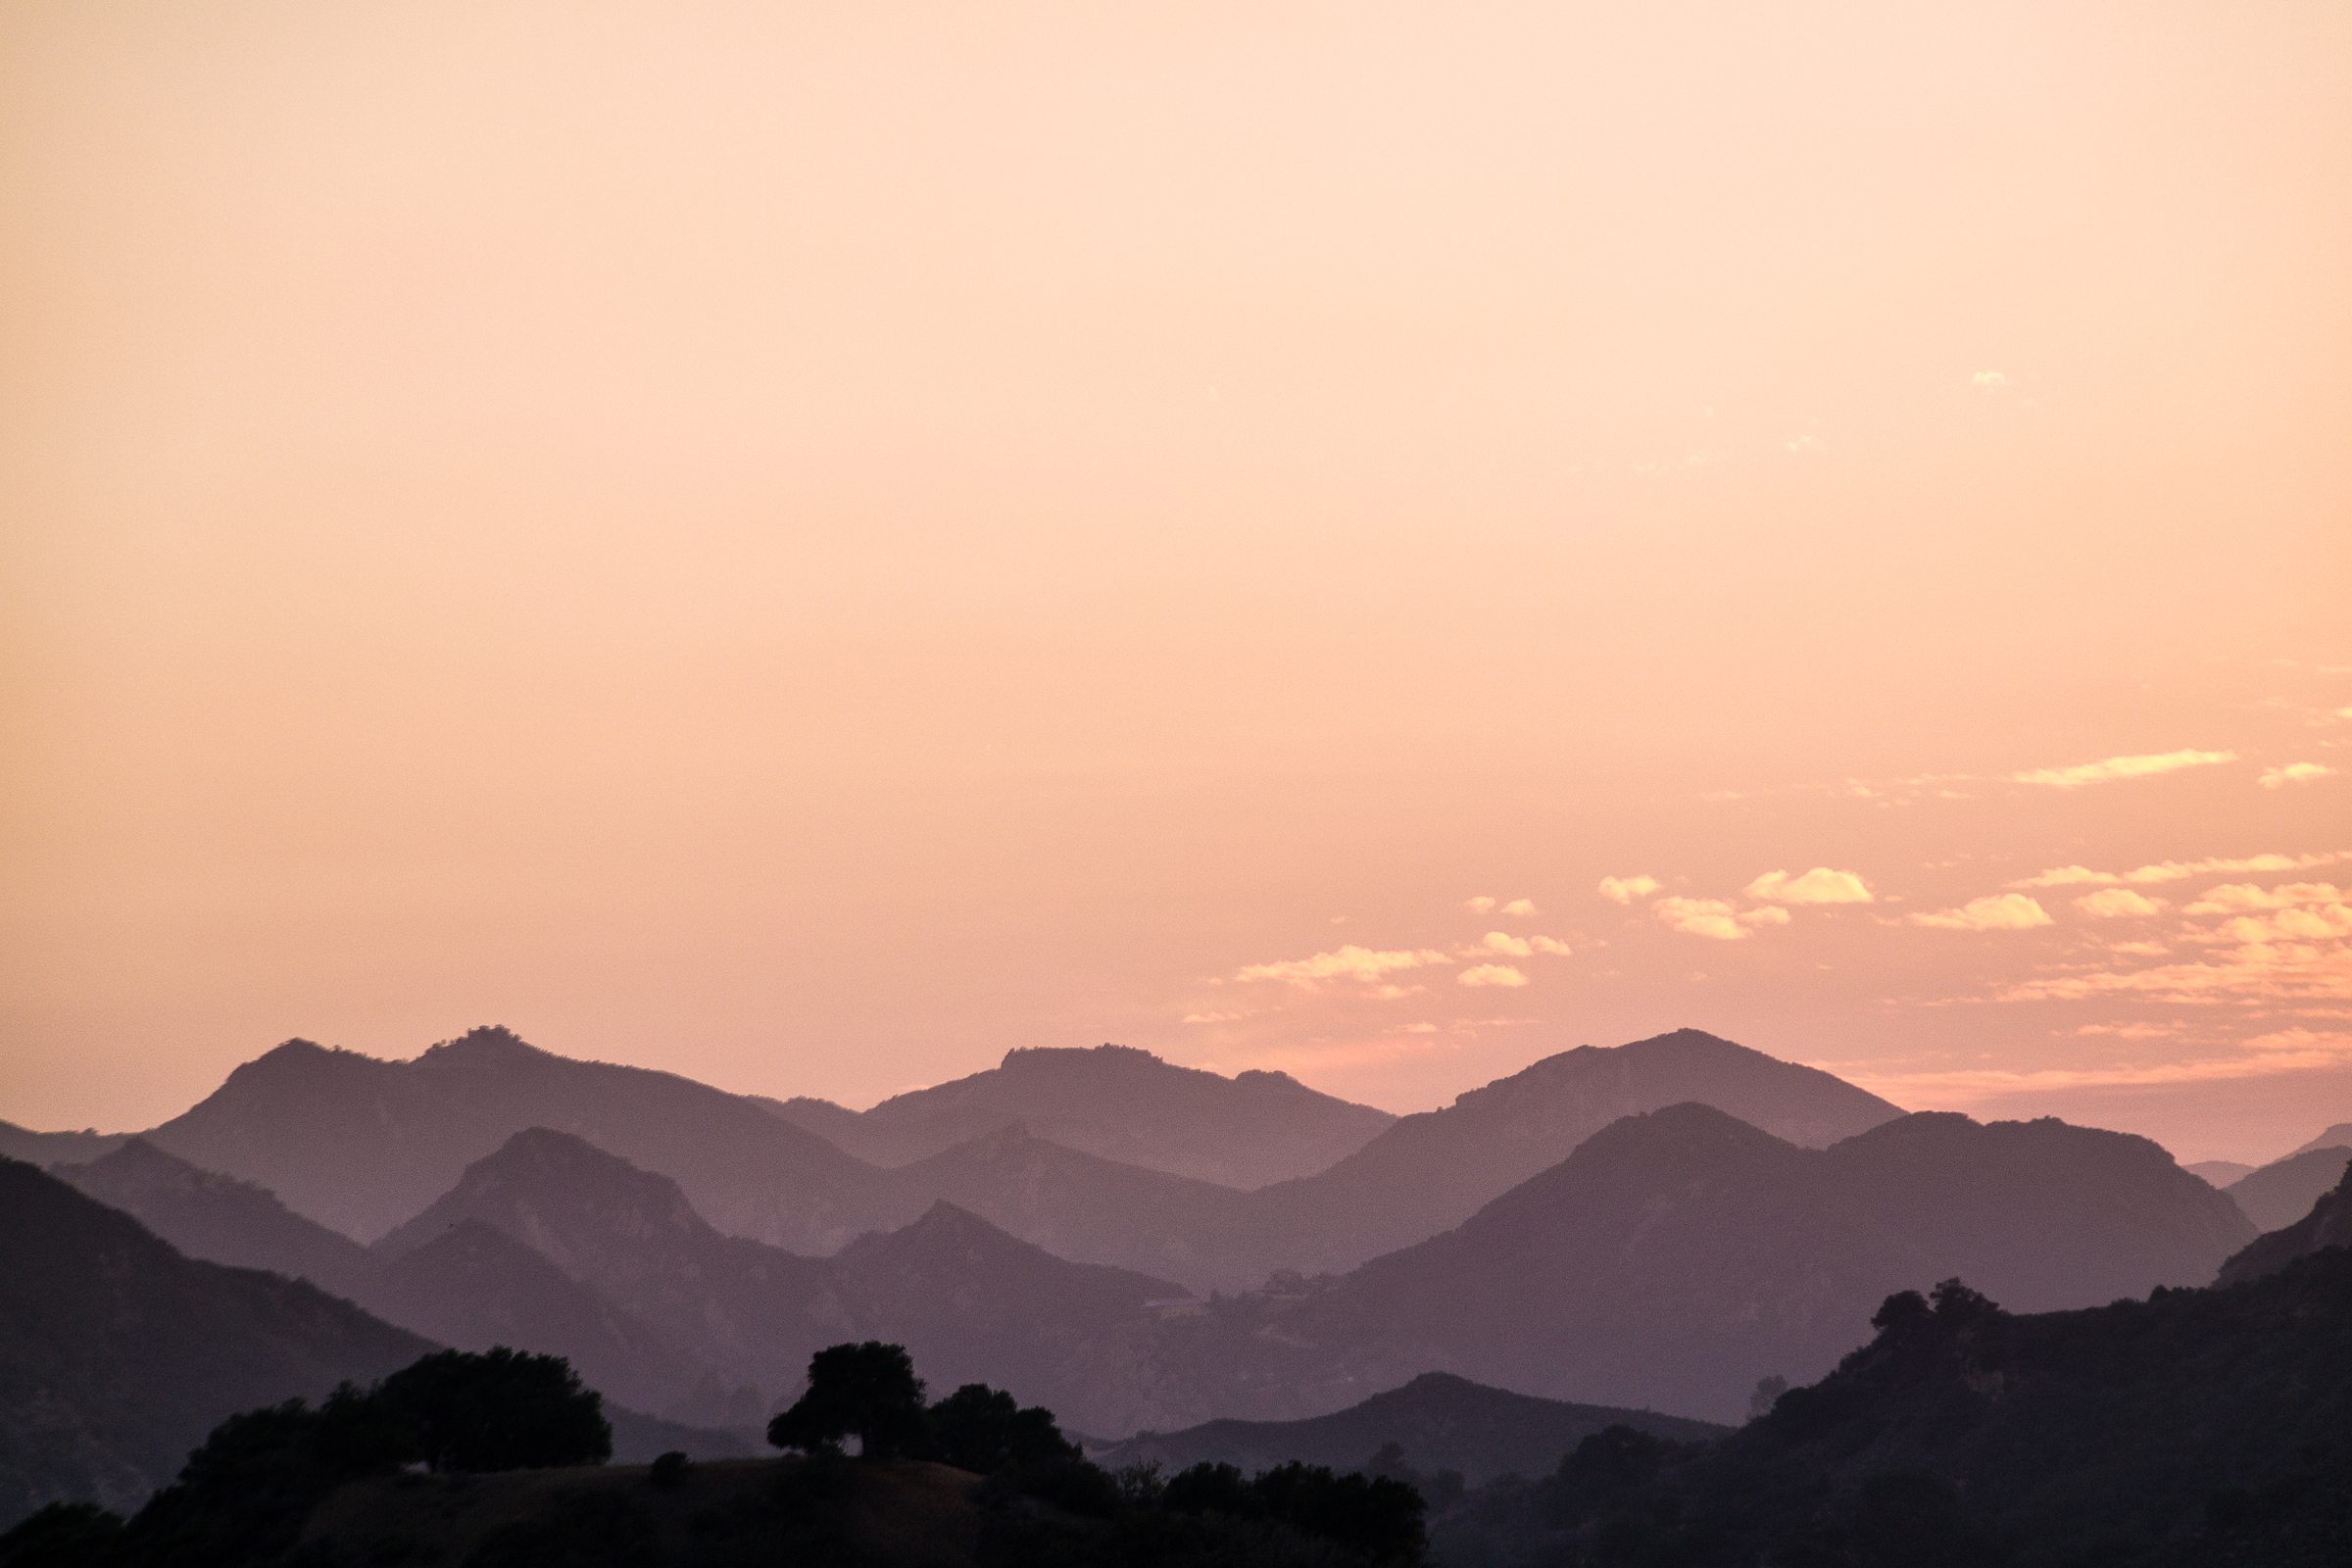 Wasim_Muklashy_Photography_Summer_Solstice_Sunset_062114_Agoura-Hills_CA_Samsung_NX30_-SAM_4940_2400